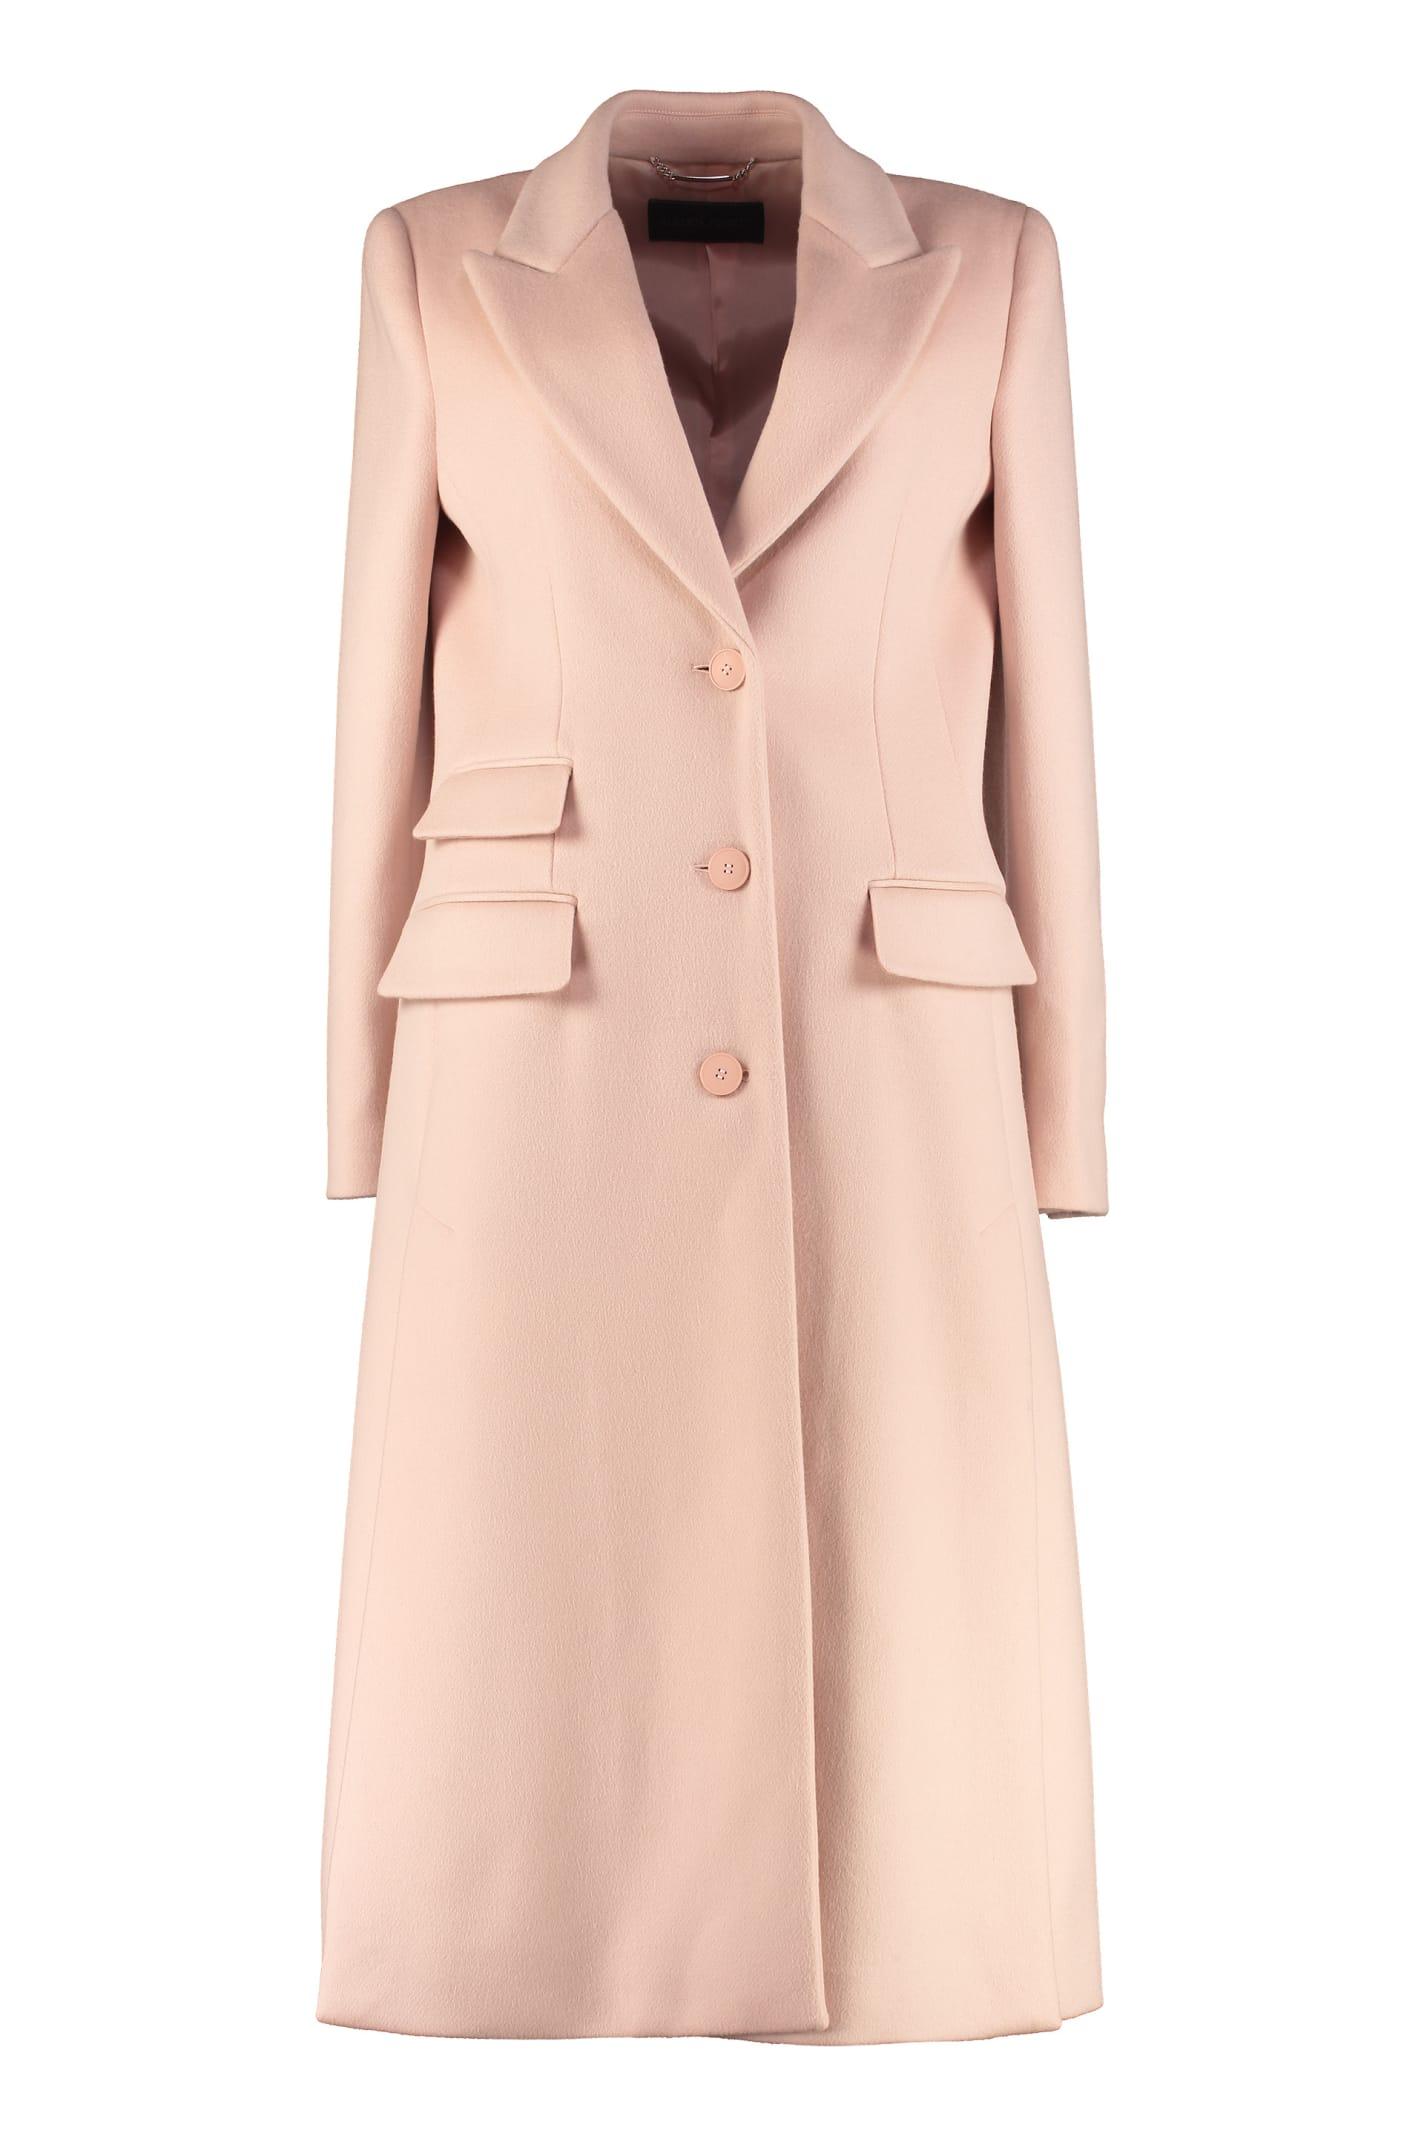 Alberta Ferretti Virgin Wool And Cashmere Coat